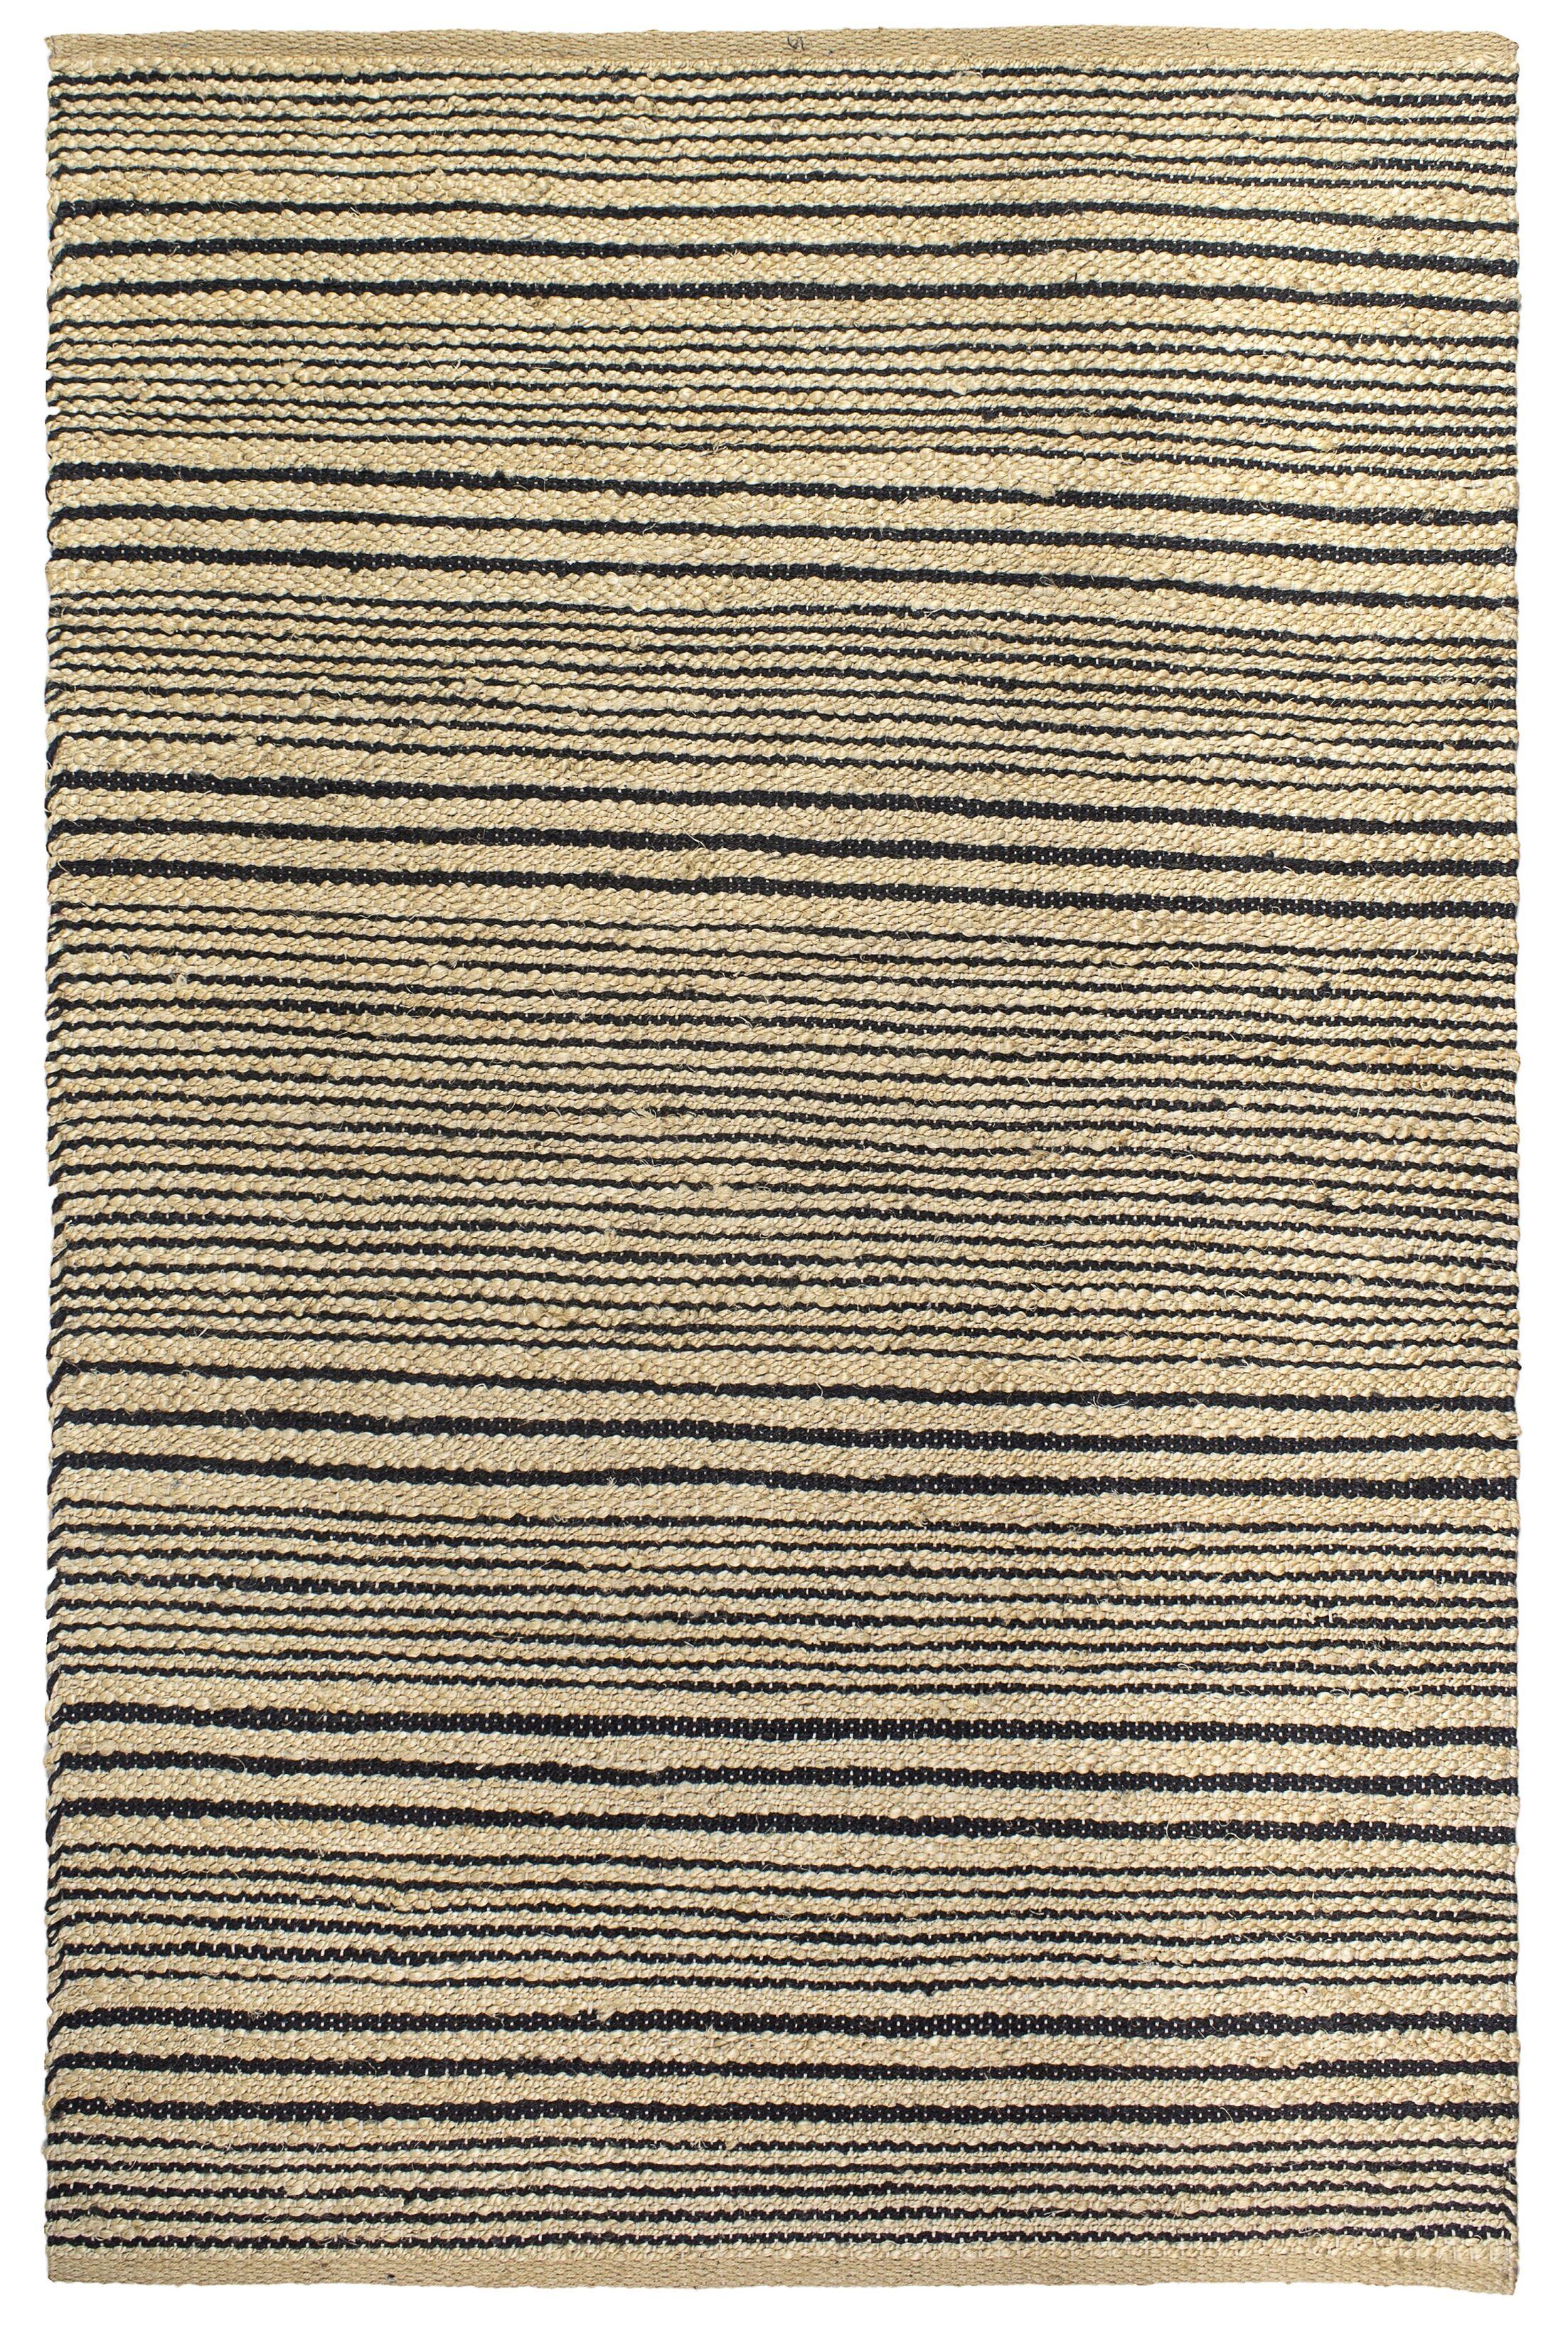 Delmer Congaree Hand-Woven Black Area Rug Rug Size: 5' x 8'